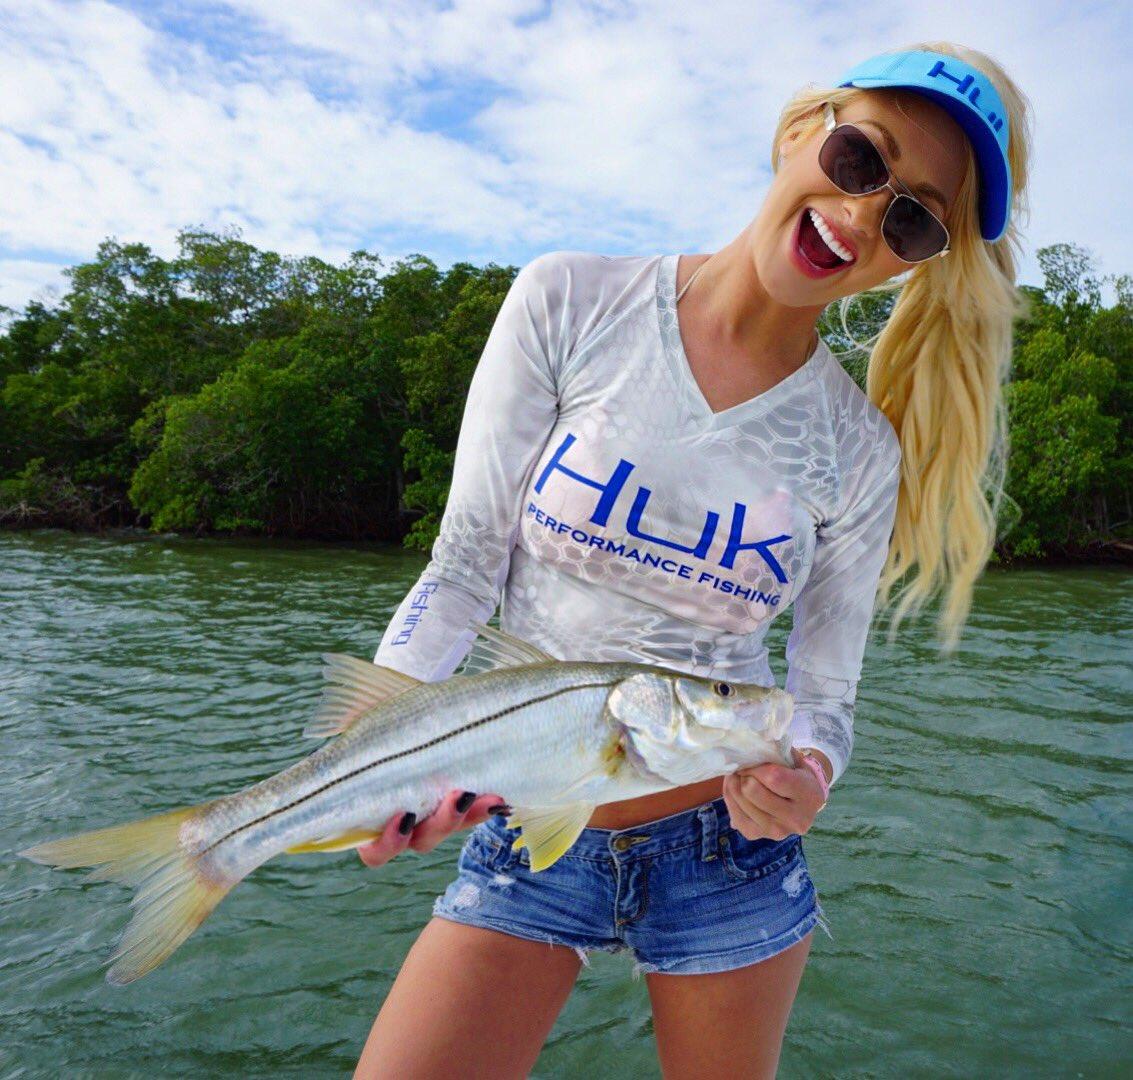 Brooke thomas brooksteronline twitter for Brooke thomas fishing